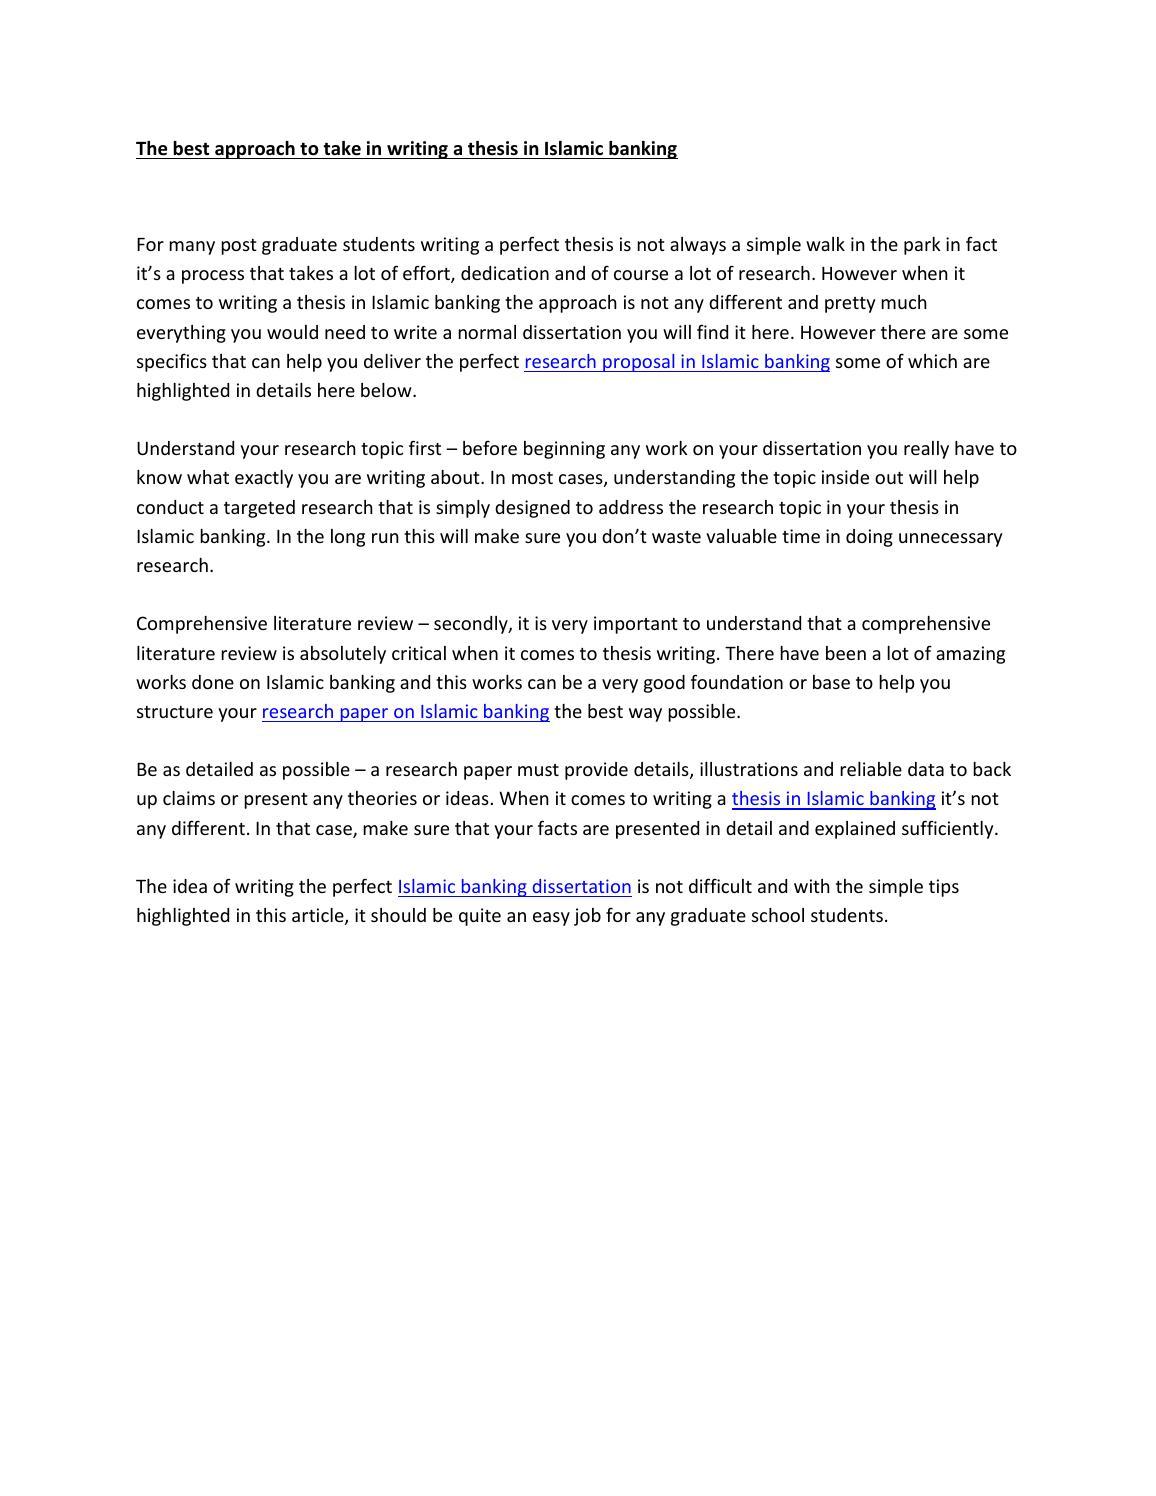 Digest writing service usa